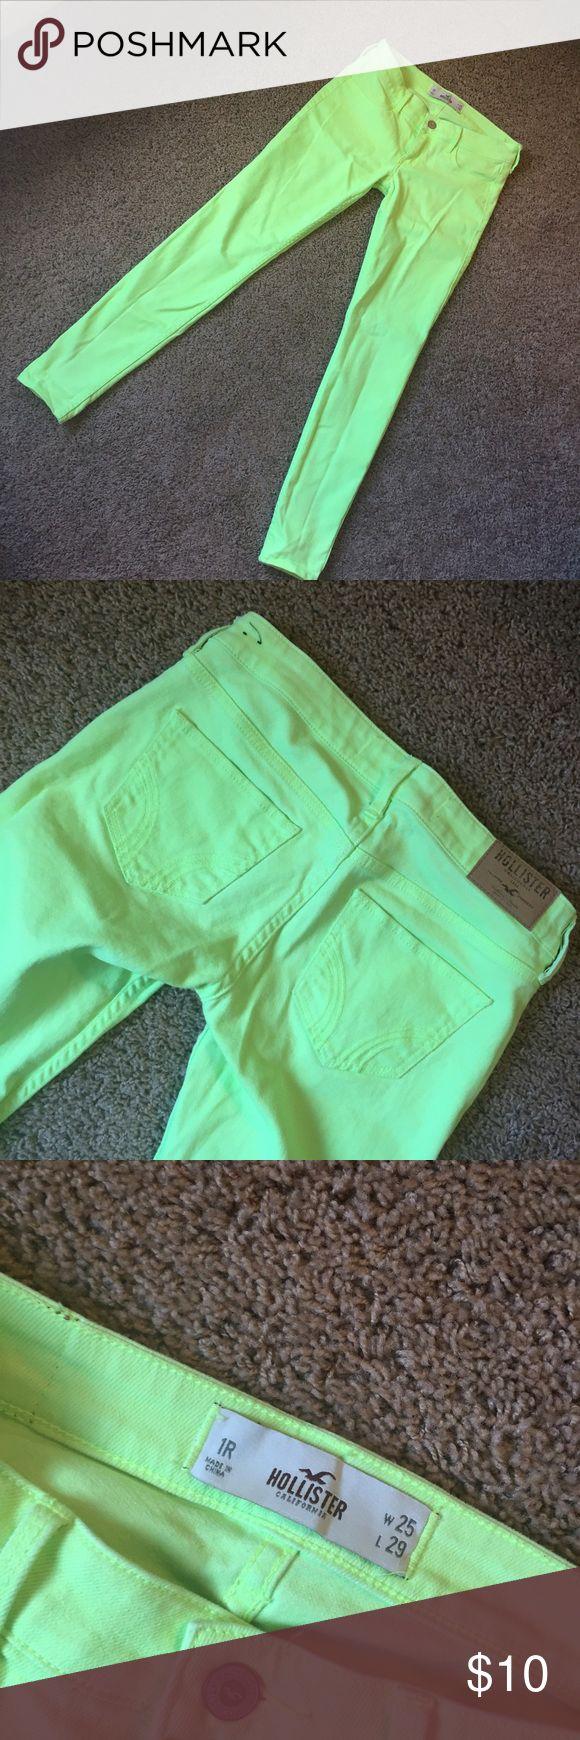 Highlighter yellow skinny jeans EUC skinny jeans from Hollister, size 1R. Hollister Jeans Skinny